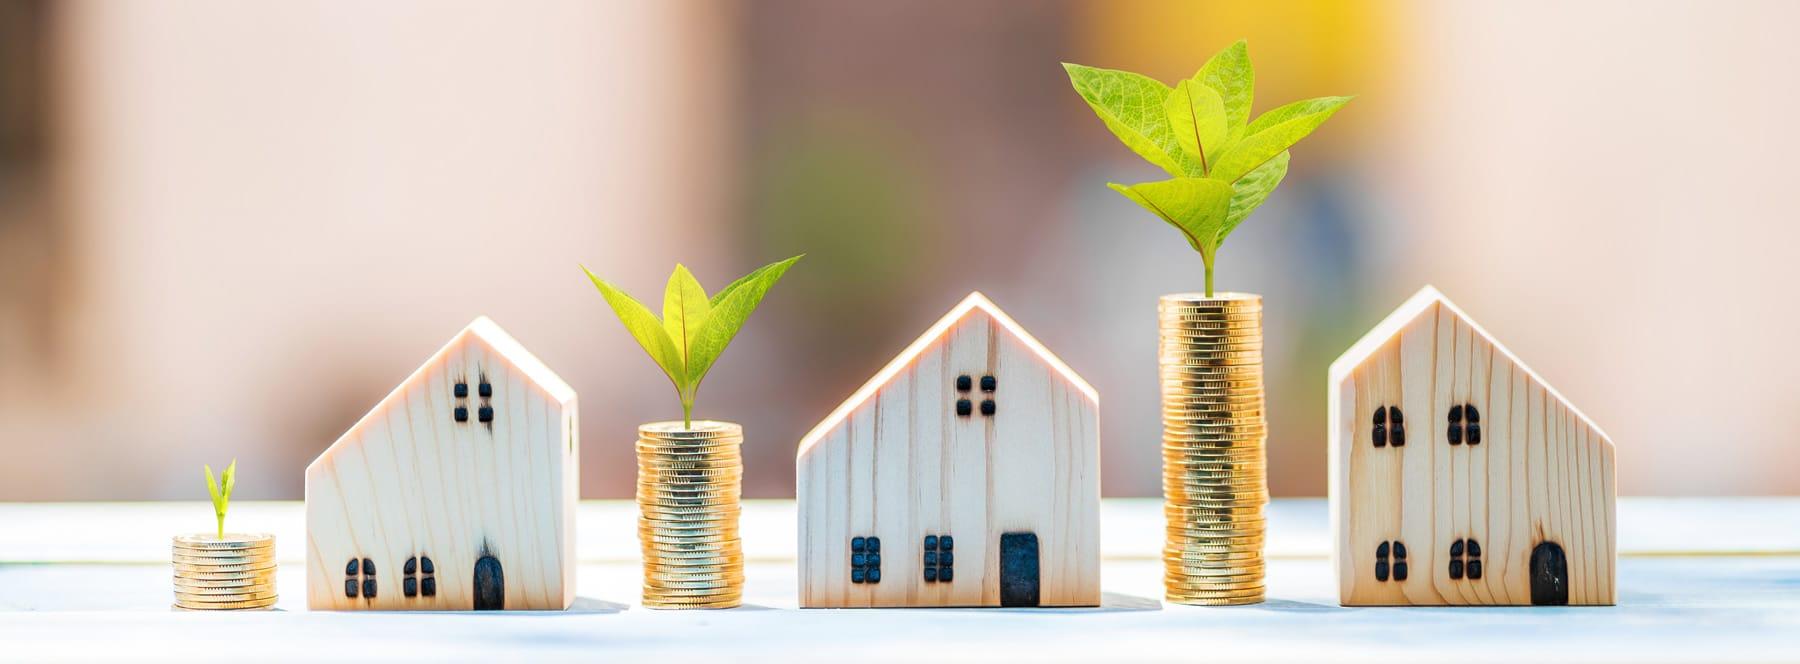 Trimonia Immobilien - Immobilie verkaufen